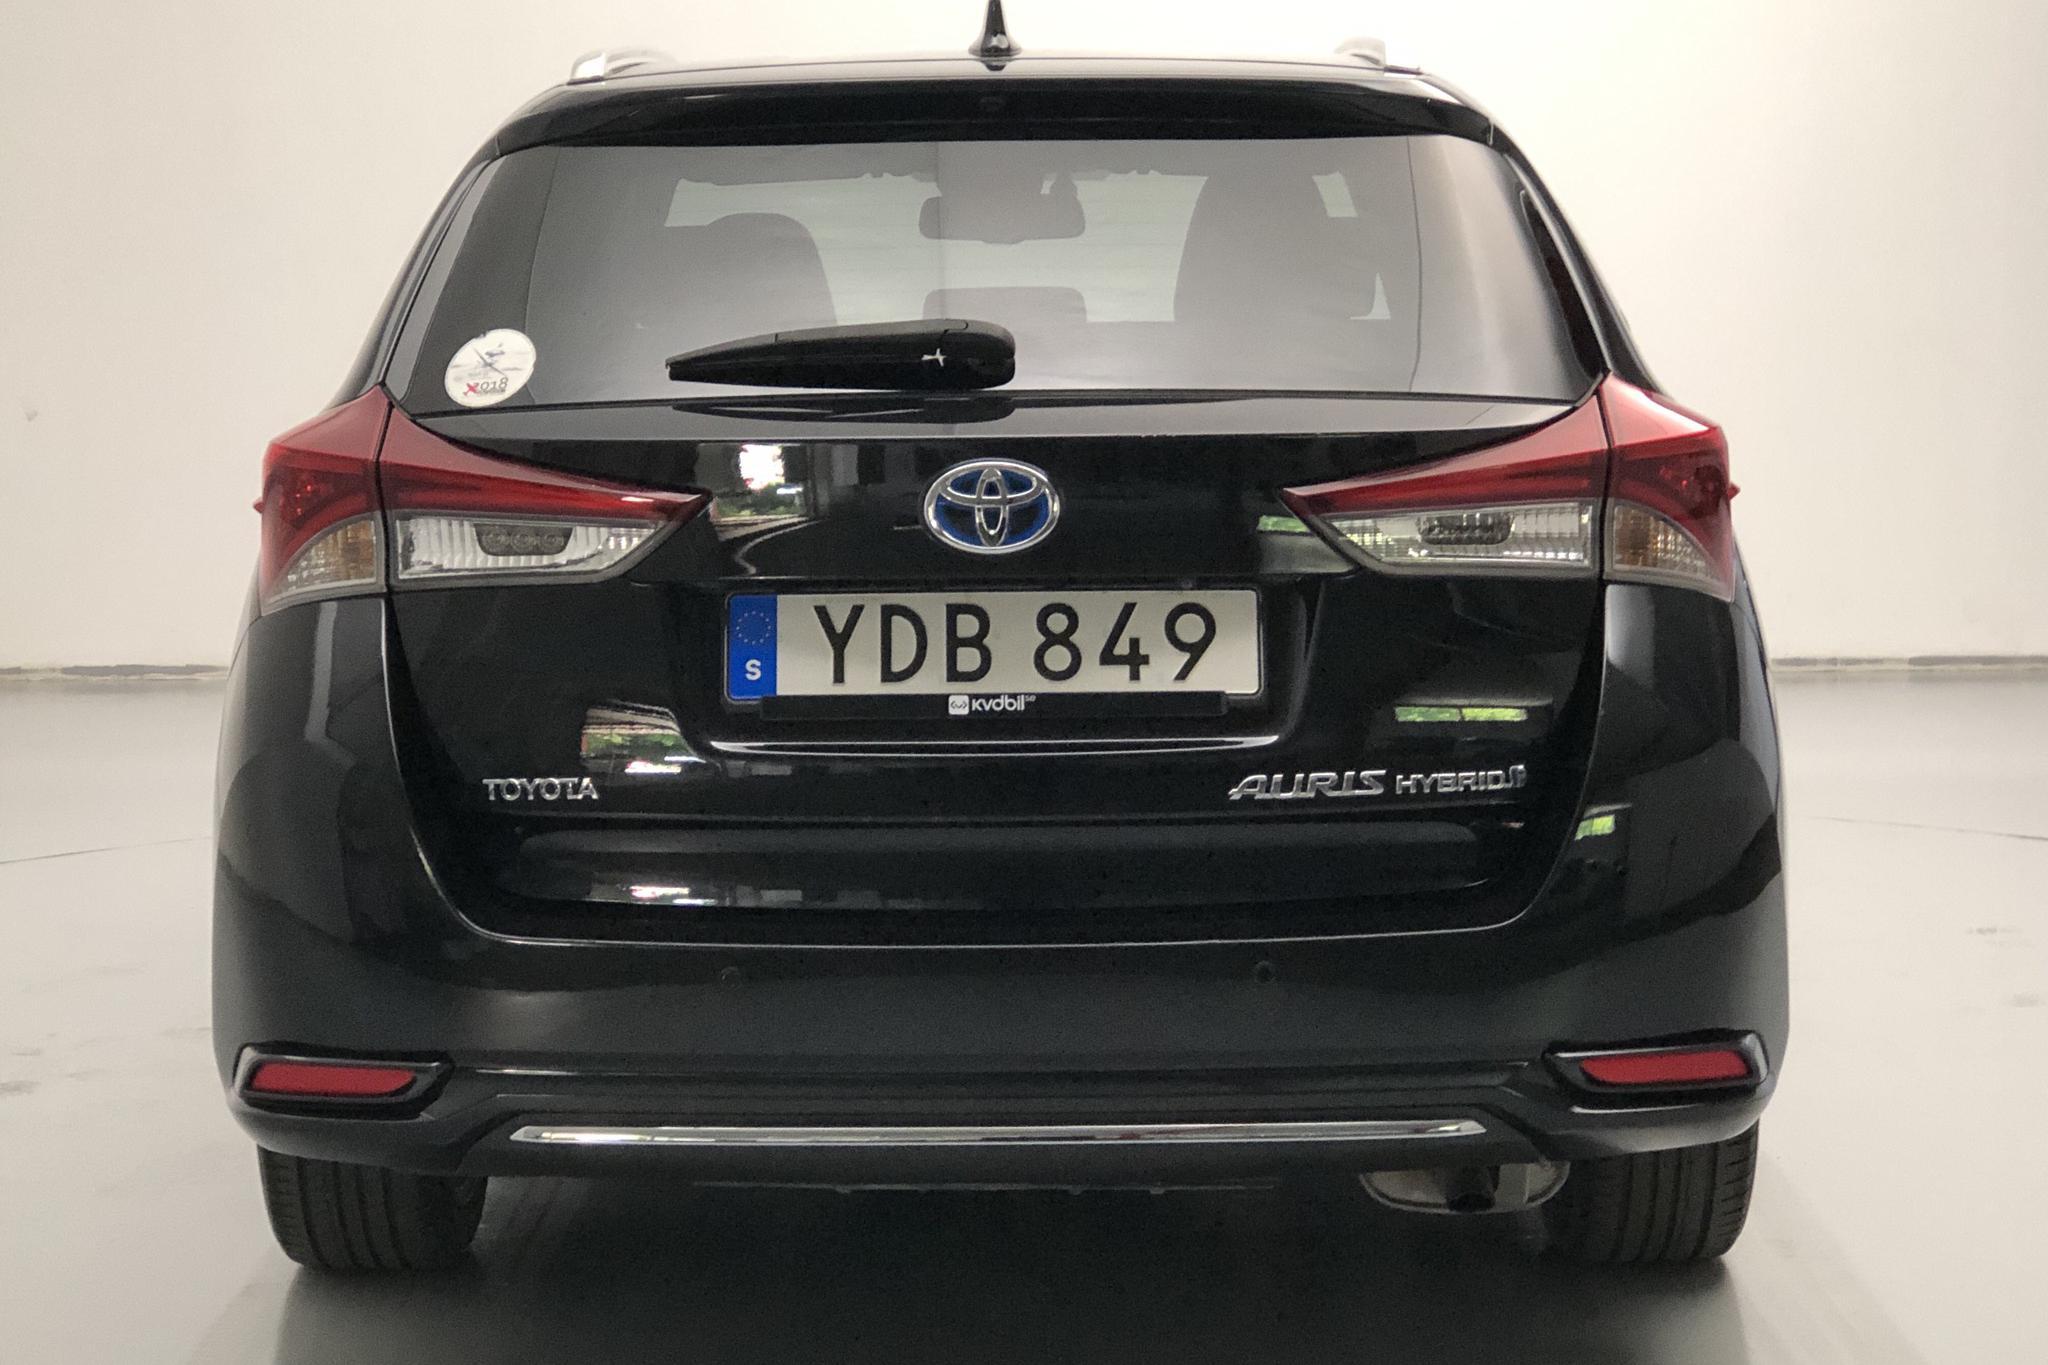 Toyota Auris 1.8 HSD Touring Sports (99hk) - 119 350 km - Automatic - black - 2016